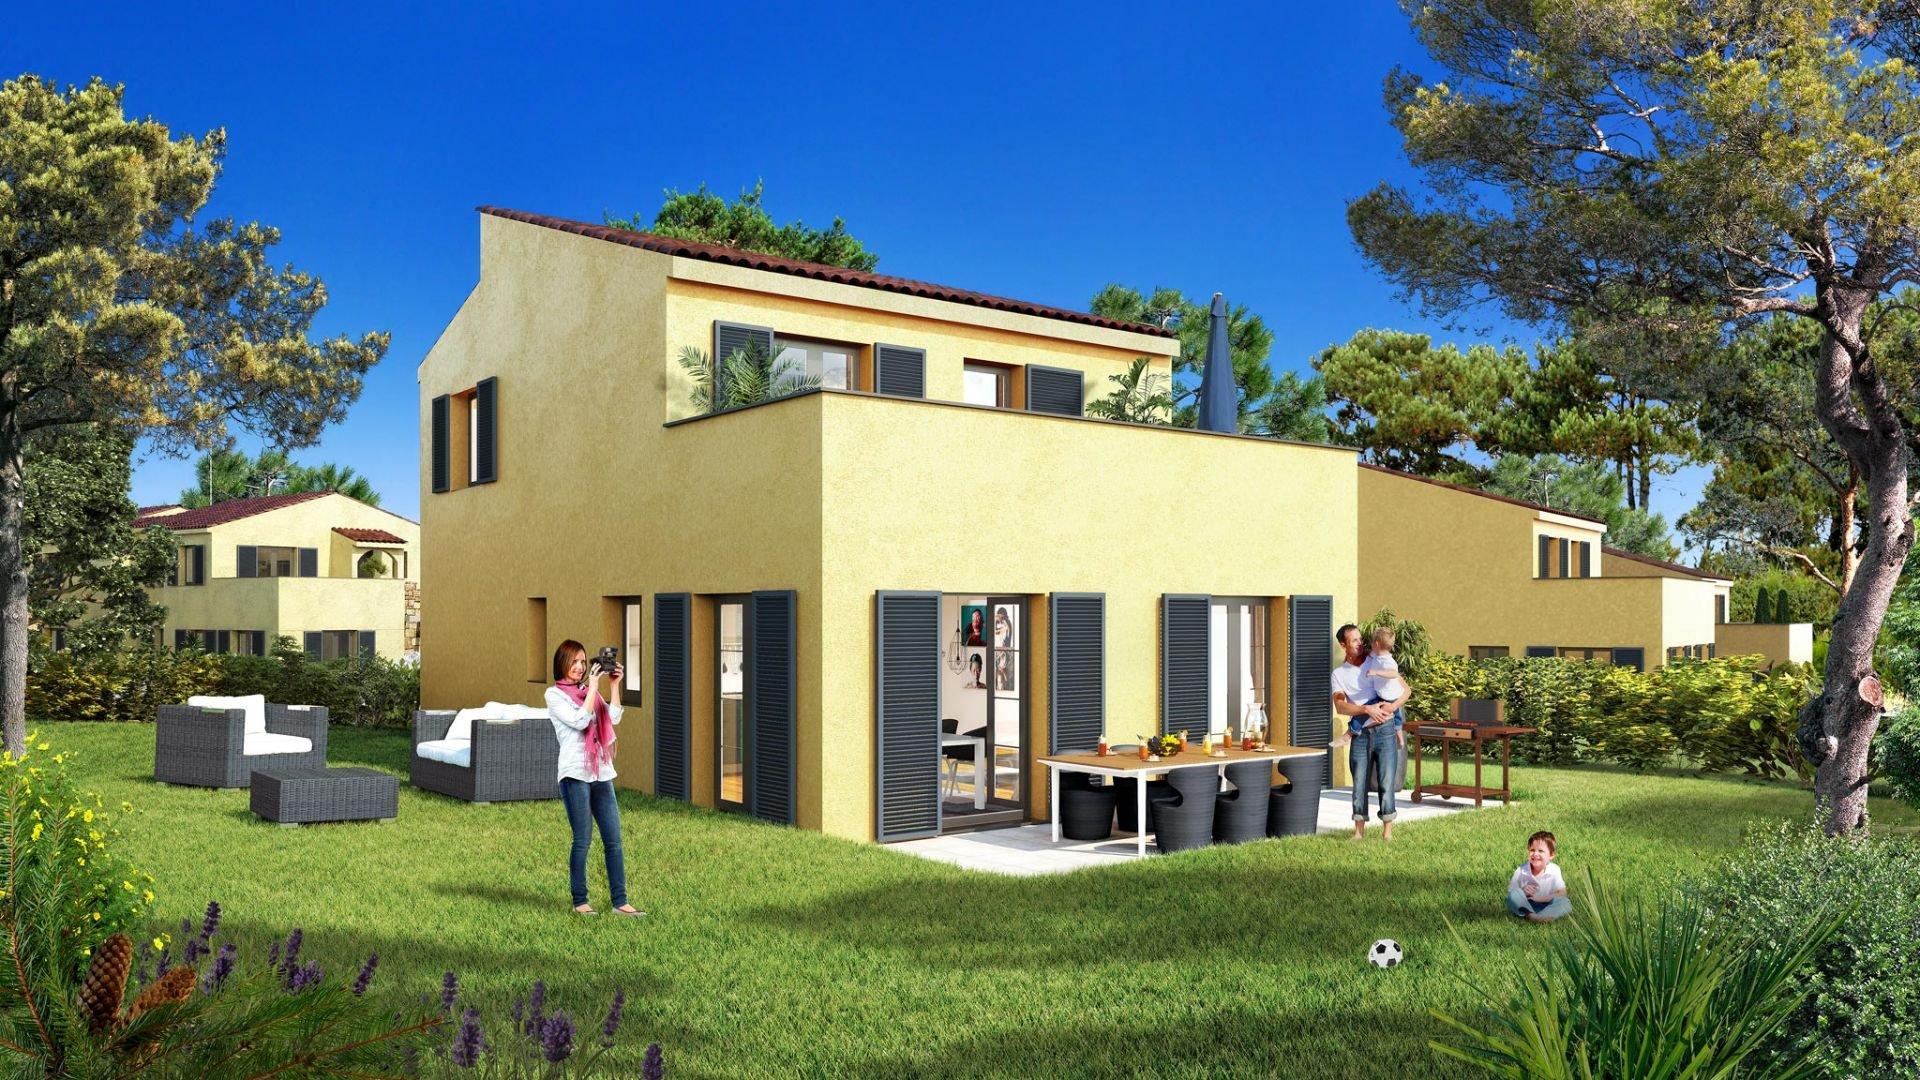 Appartement 3 pièces avec jardin - Calenzana